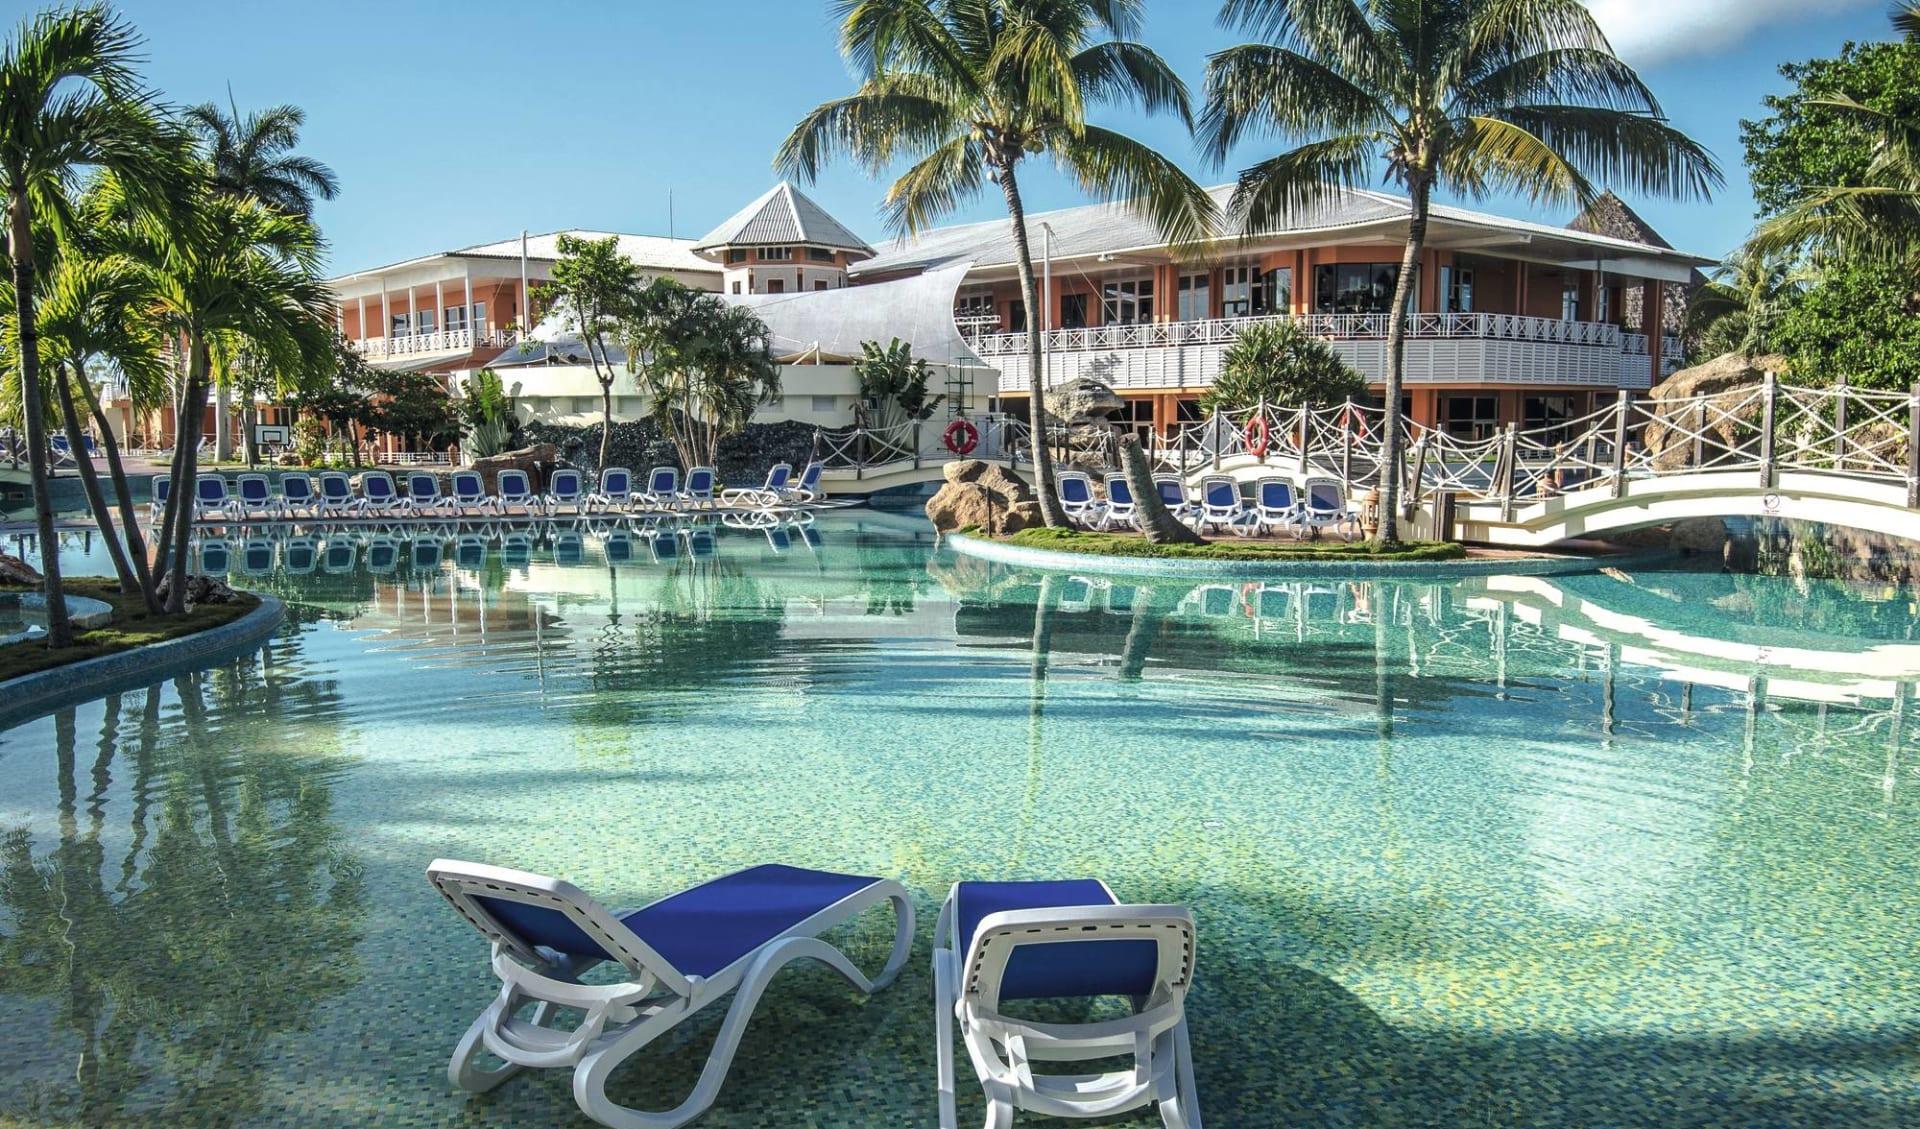 Royalton Hicacos in Varadero: pool Royalton Hicacos Resort & Spa - Swimming pool and hotel building - Latinconnect